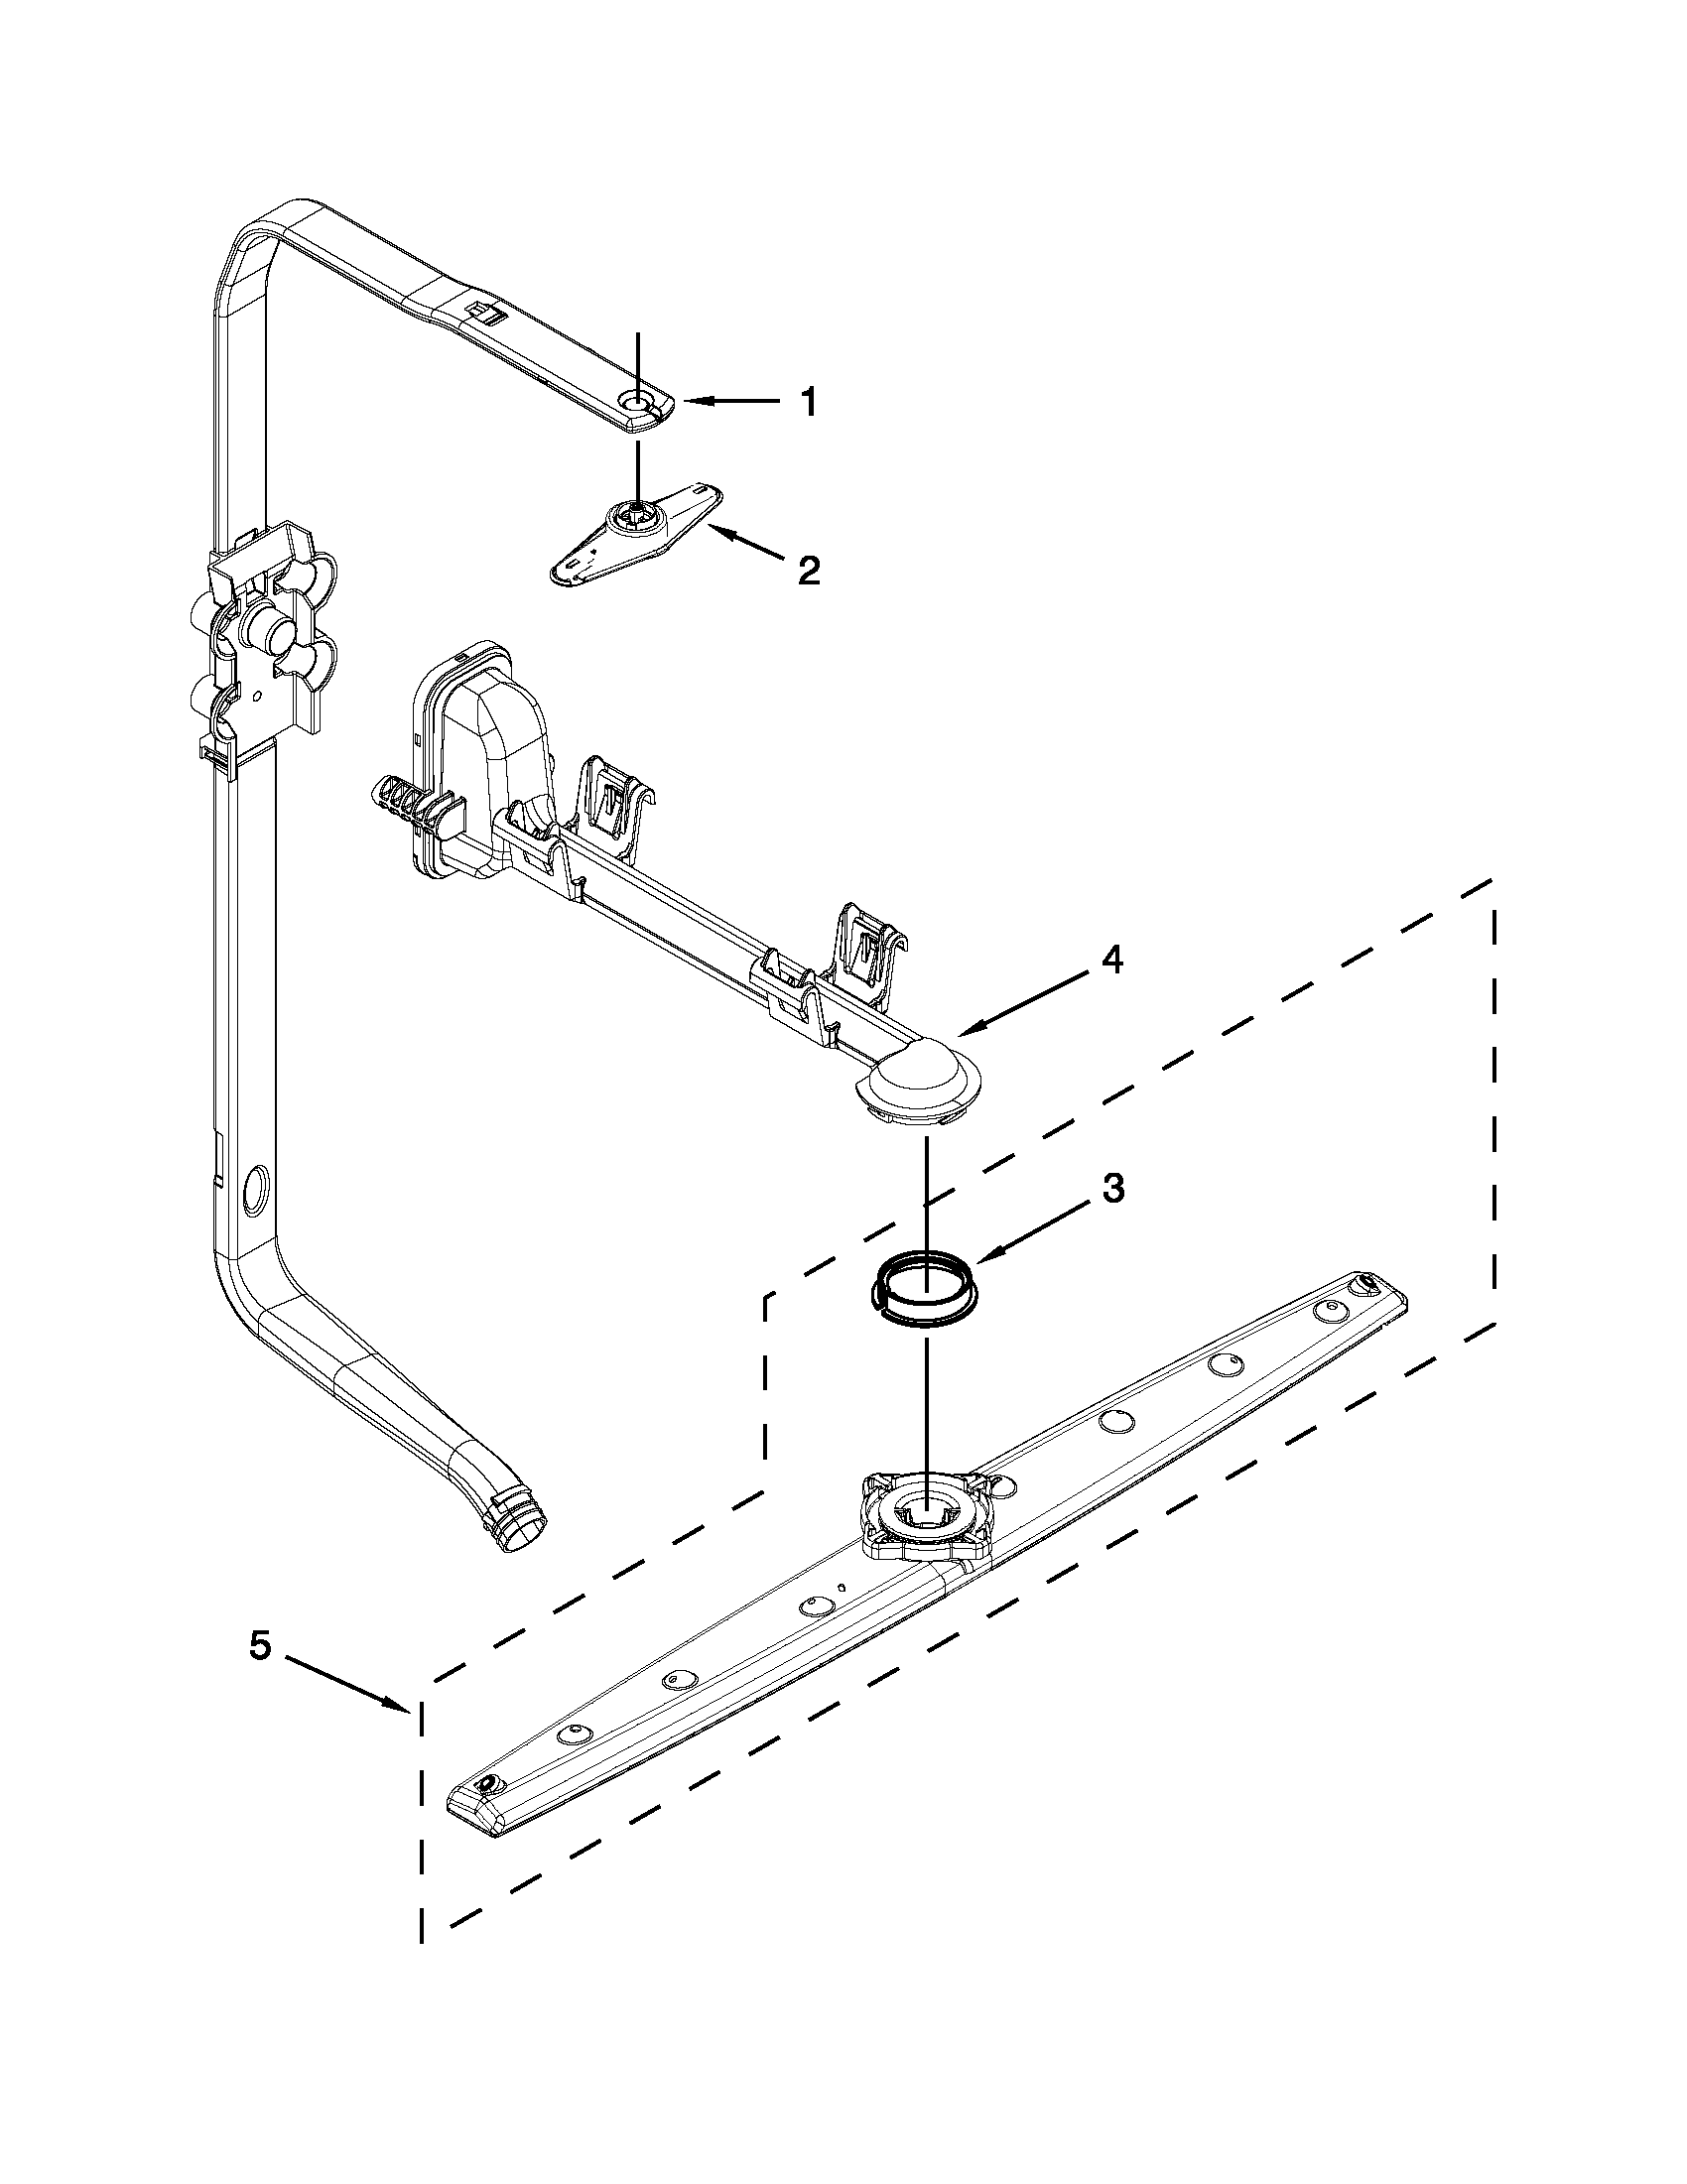 hight resolution of kitchenaid dishwasher wiring harnes diagram